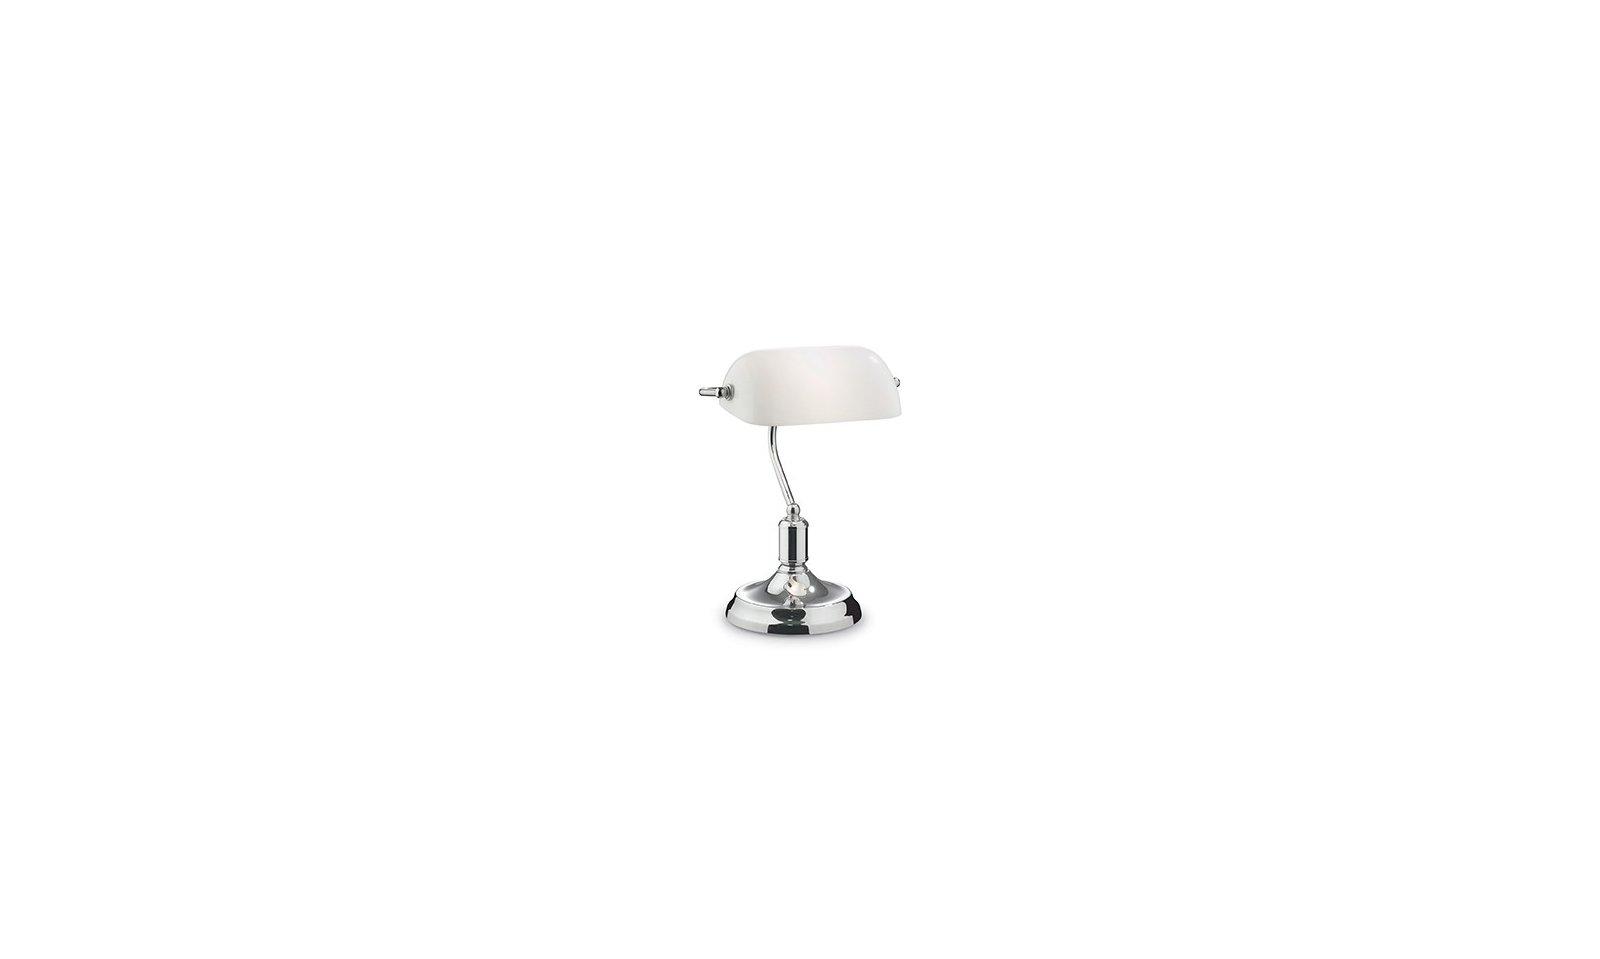 Ideal lux lawyer lampada da tavolo contemporanea in - Ideal lux lampade da tavolo ...